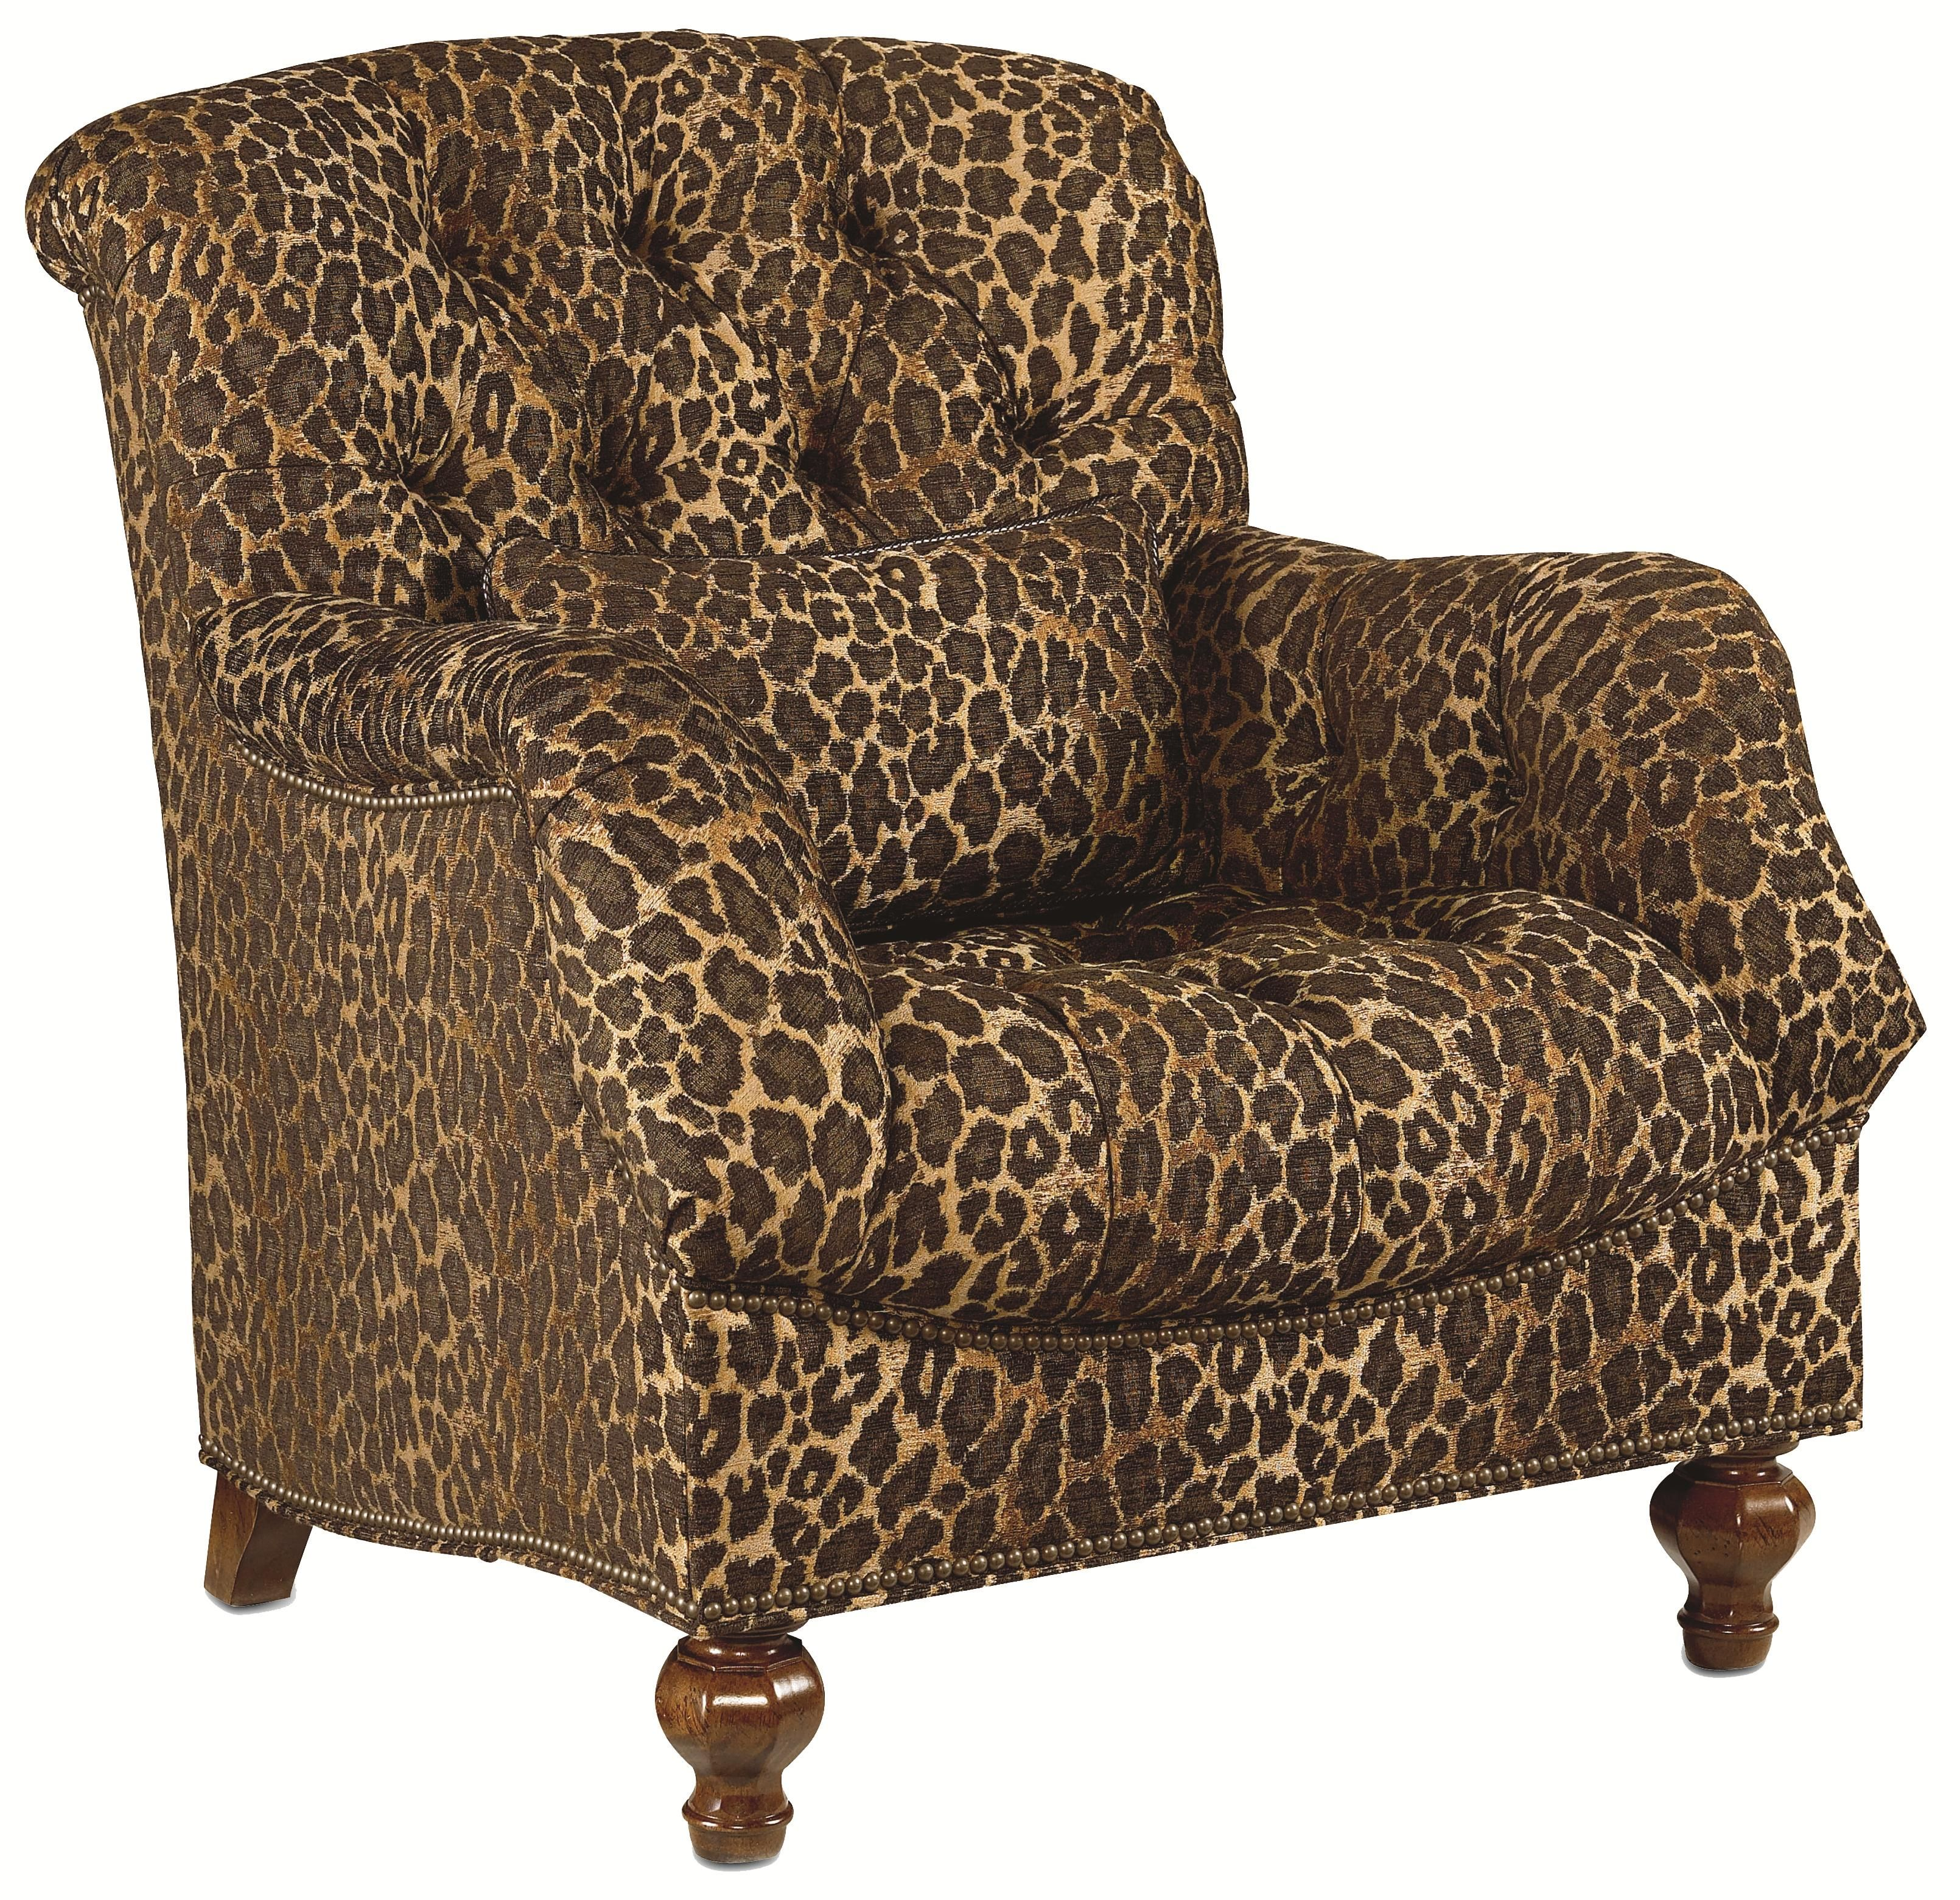 Leopard Print Tufted Chair